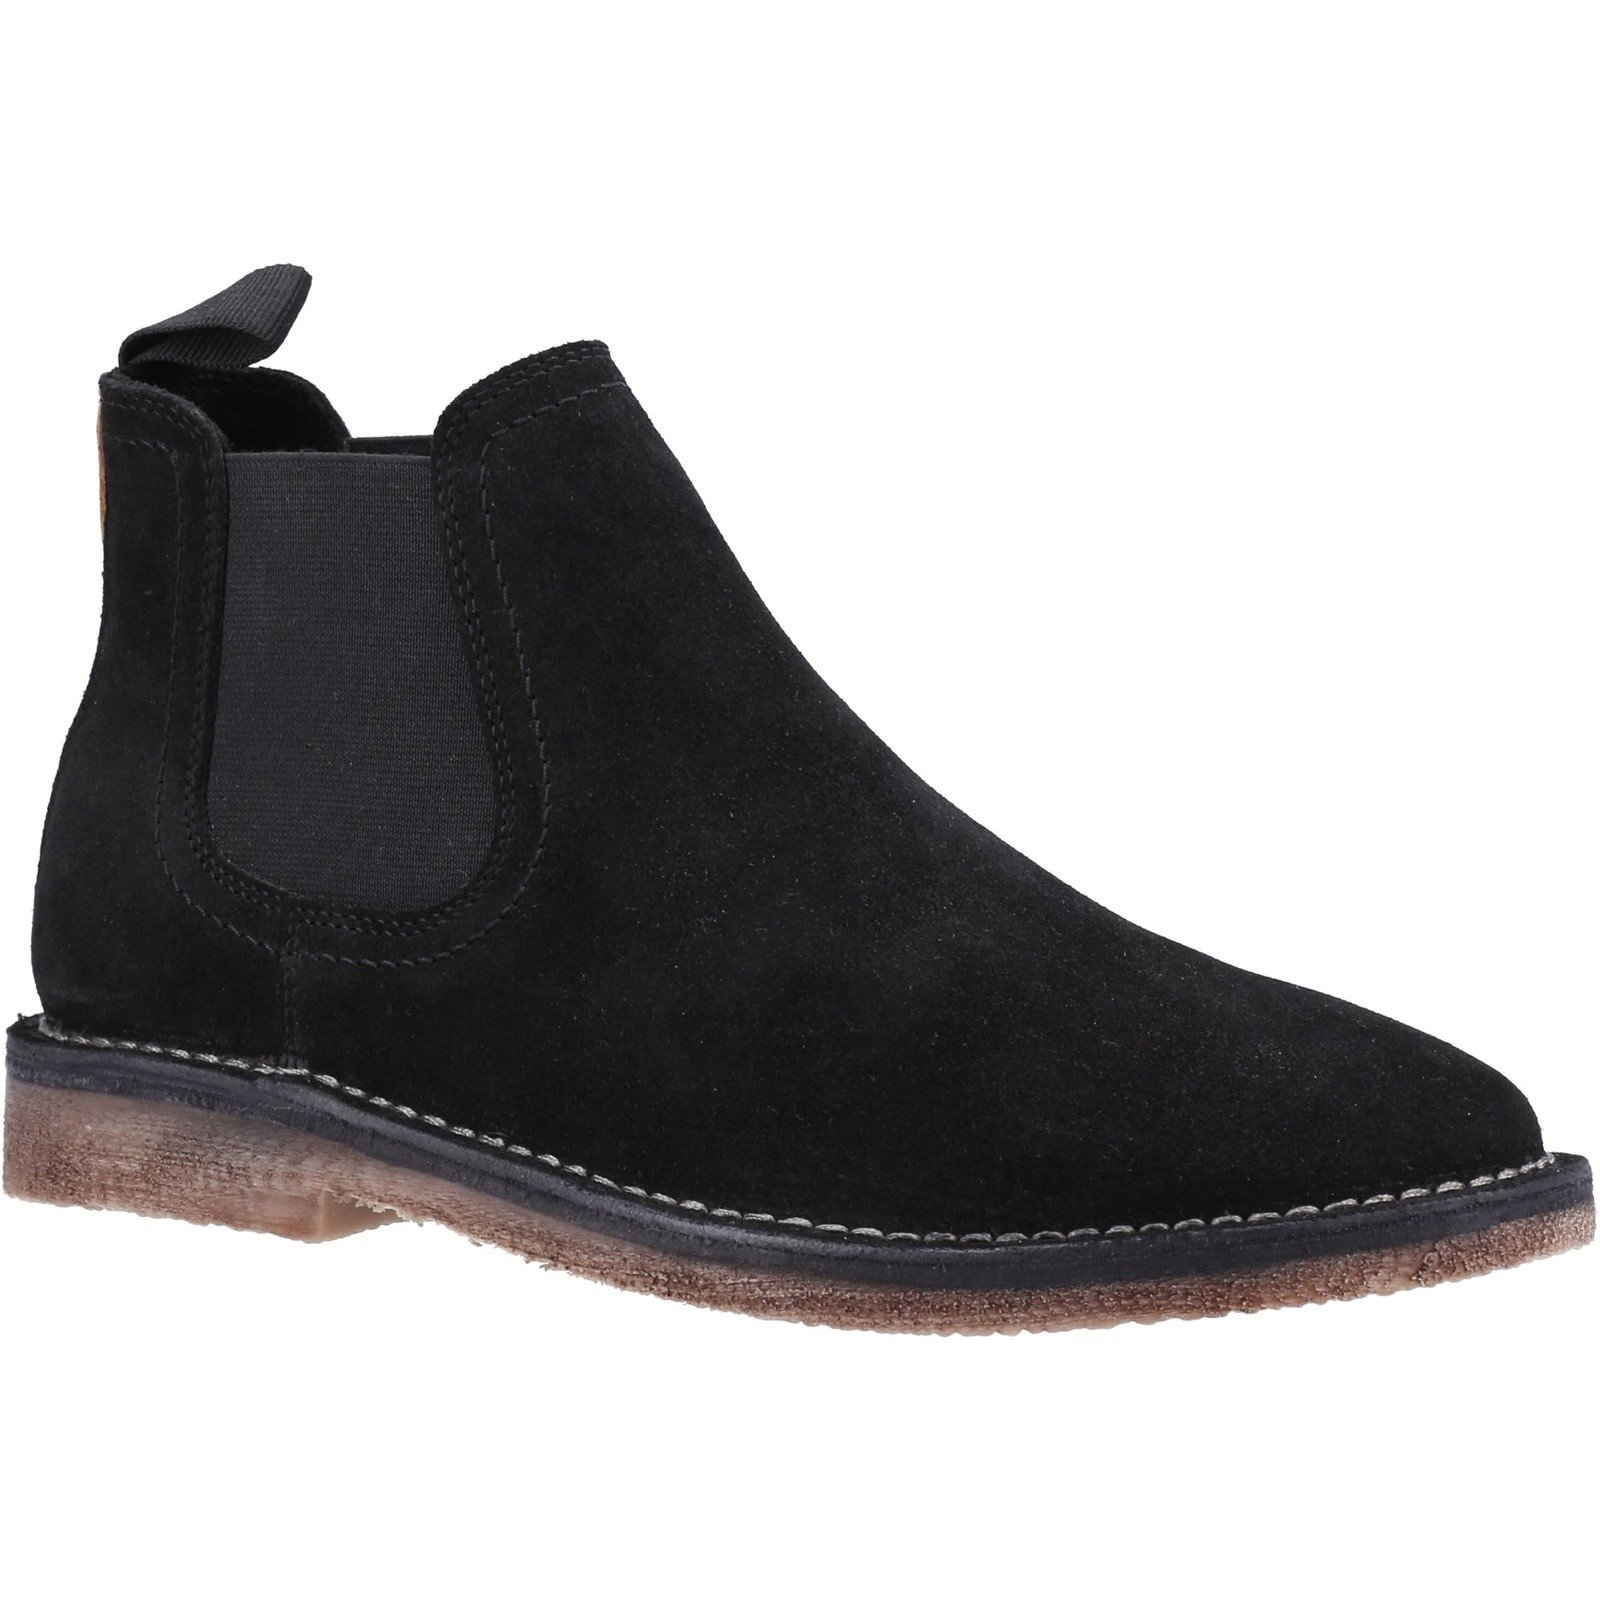 Hush Puppies Men's Shaun Leather Chelsea Boot Various Colours 32897 - Black 7